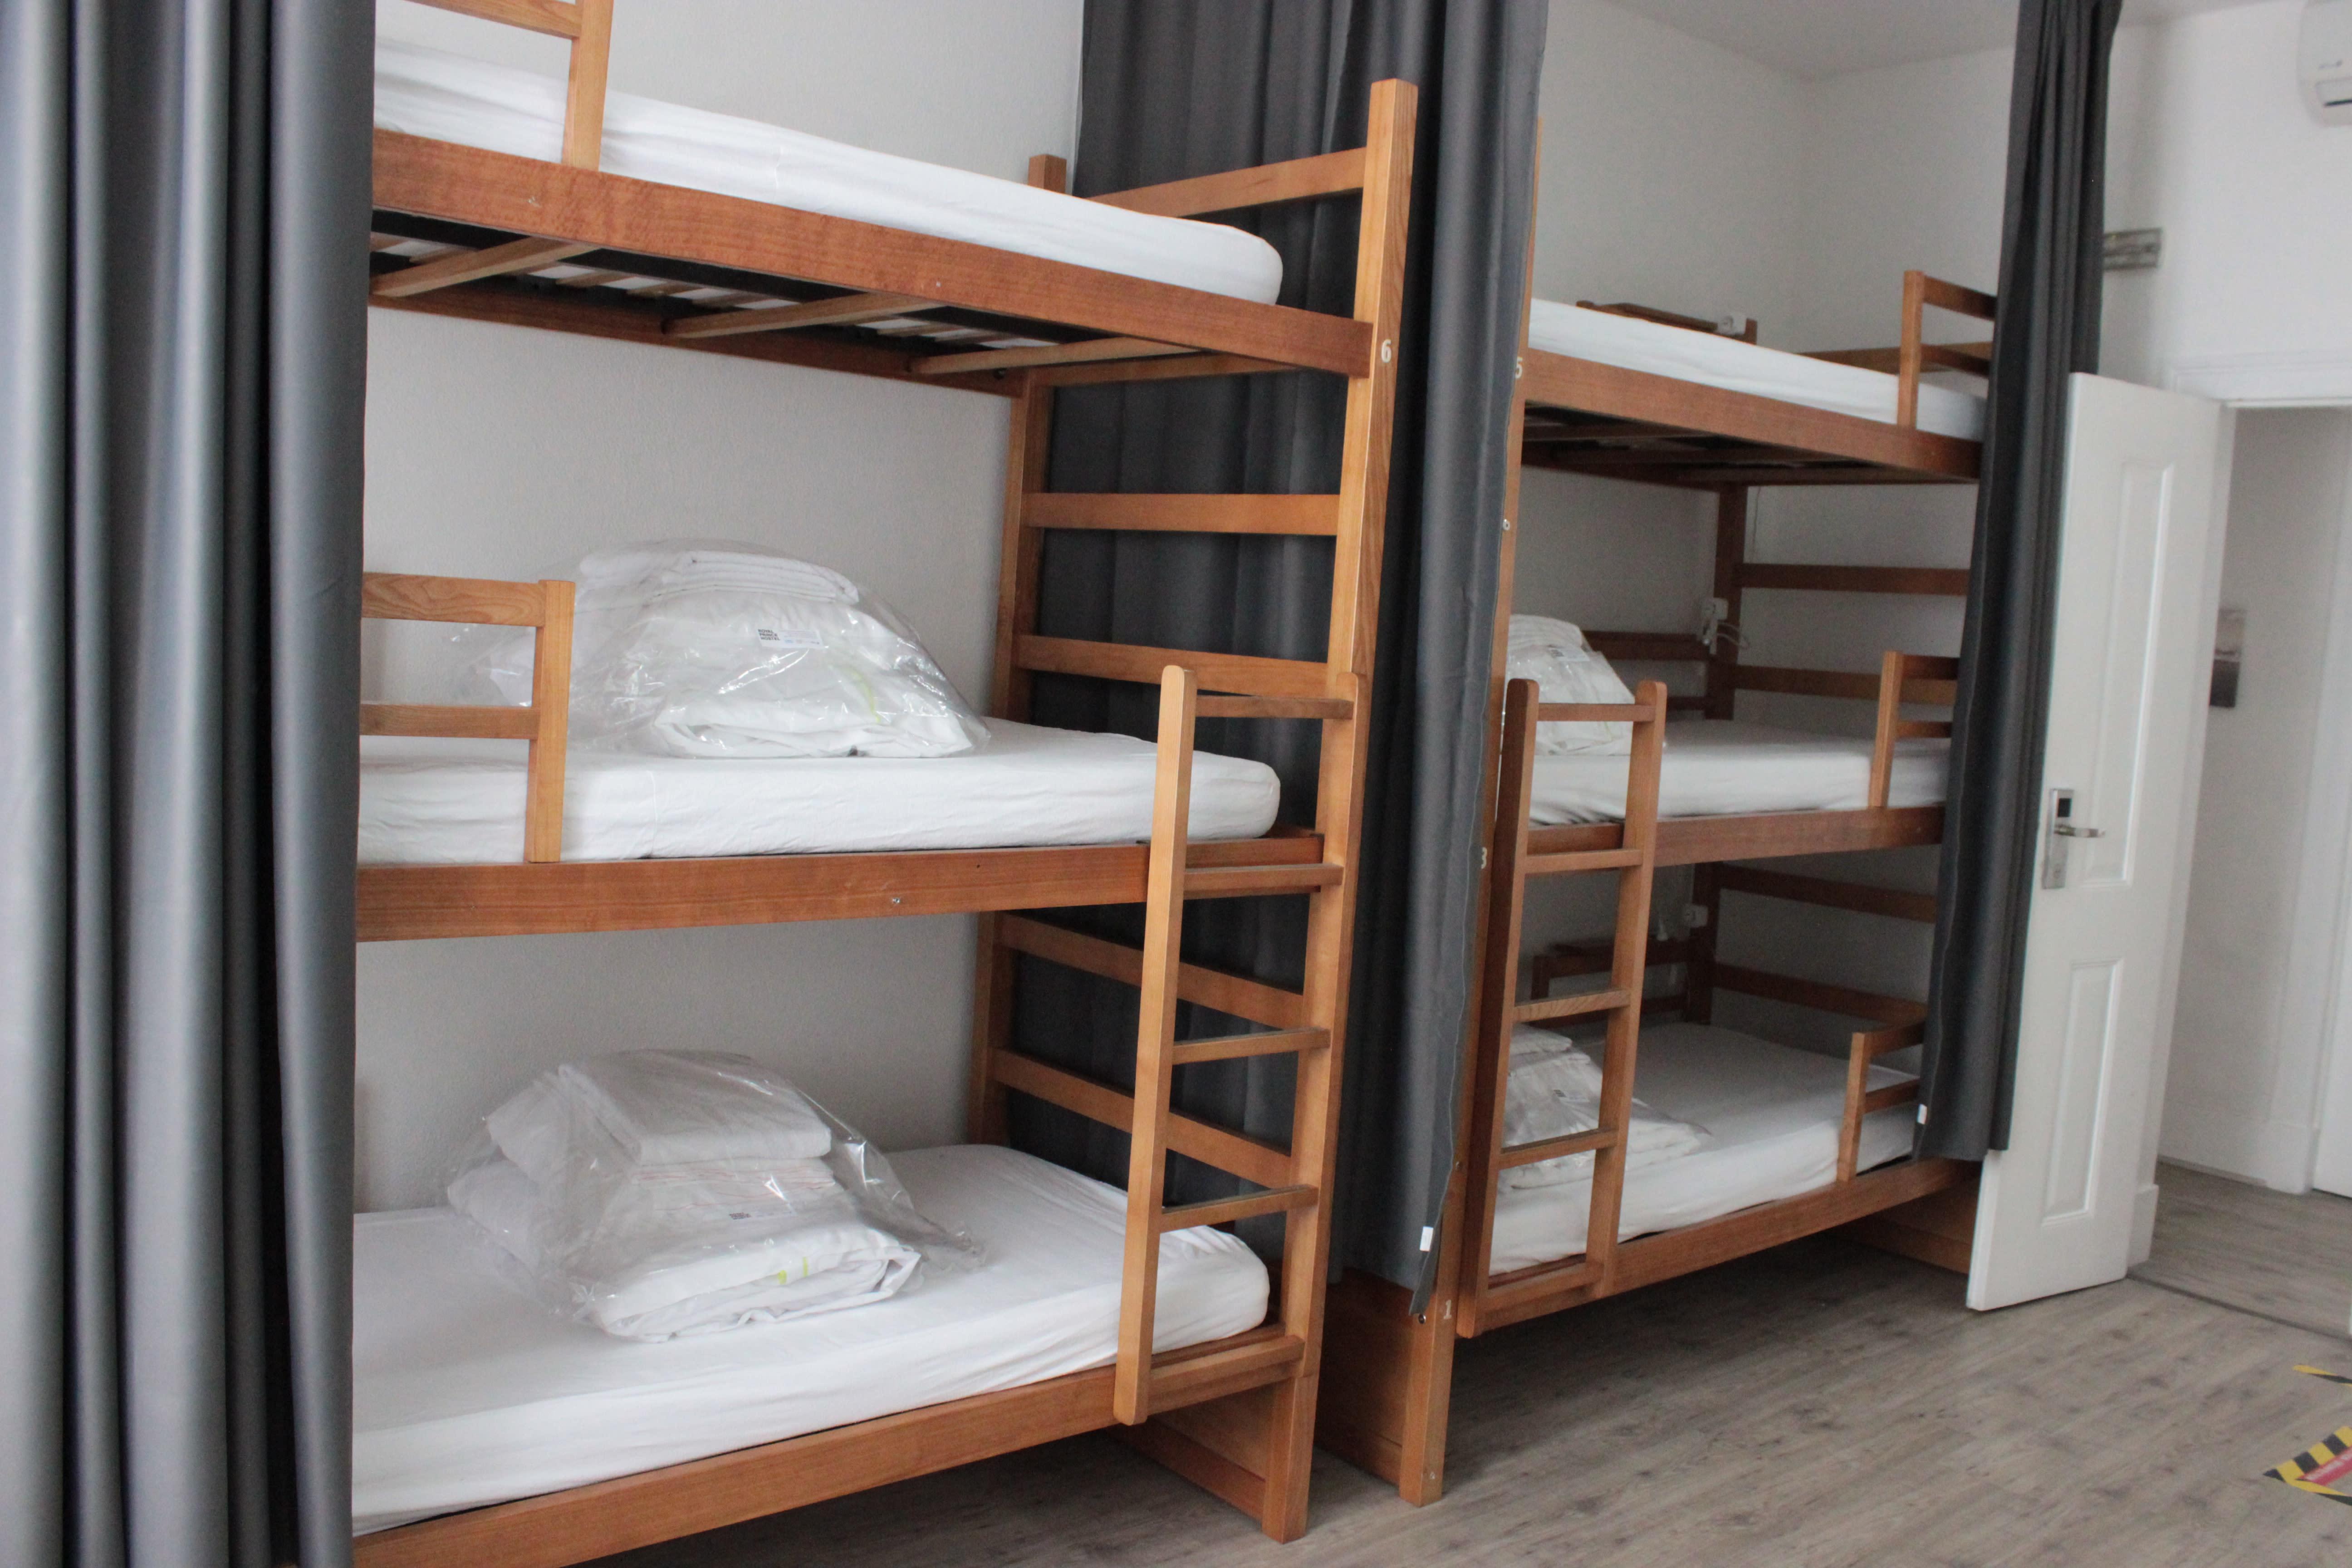 HOSTEL - Royal Prince Hostel